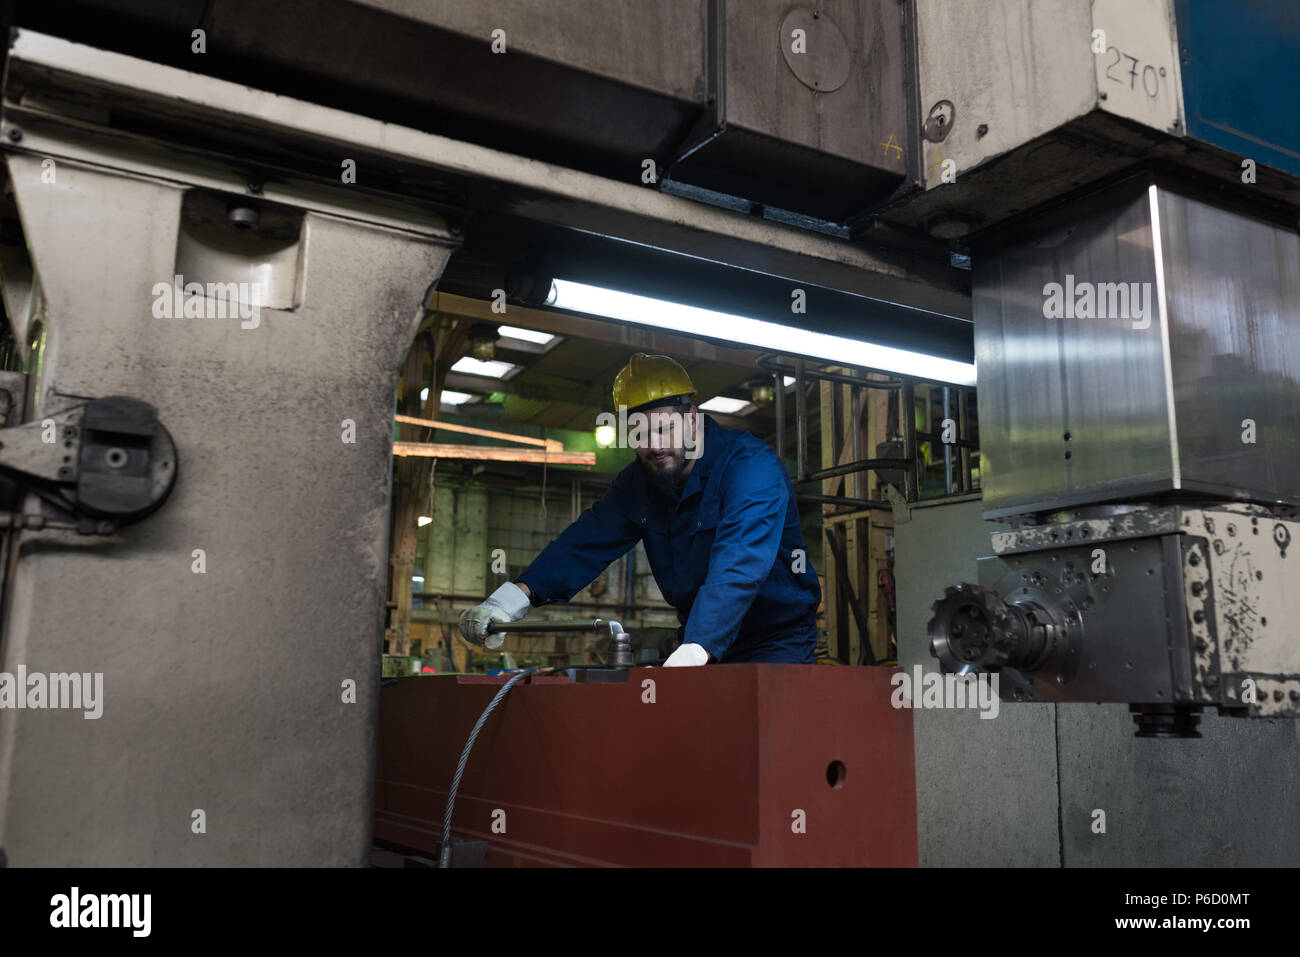 Technician in protective workwear cutting metal - Stock Image